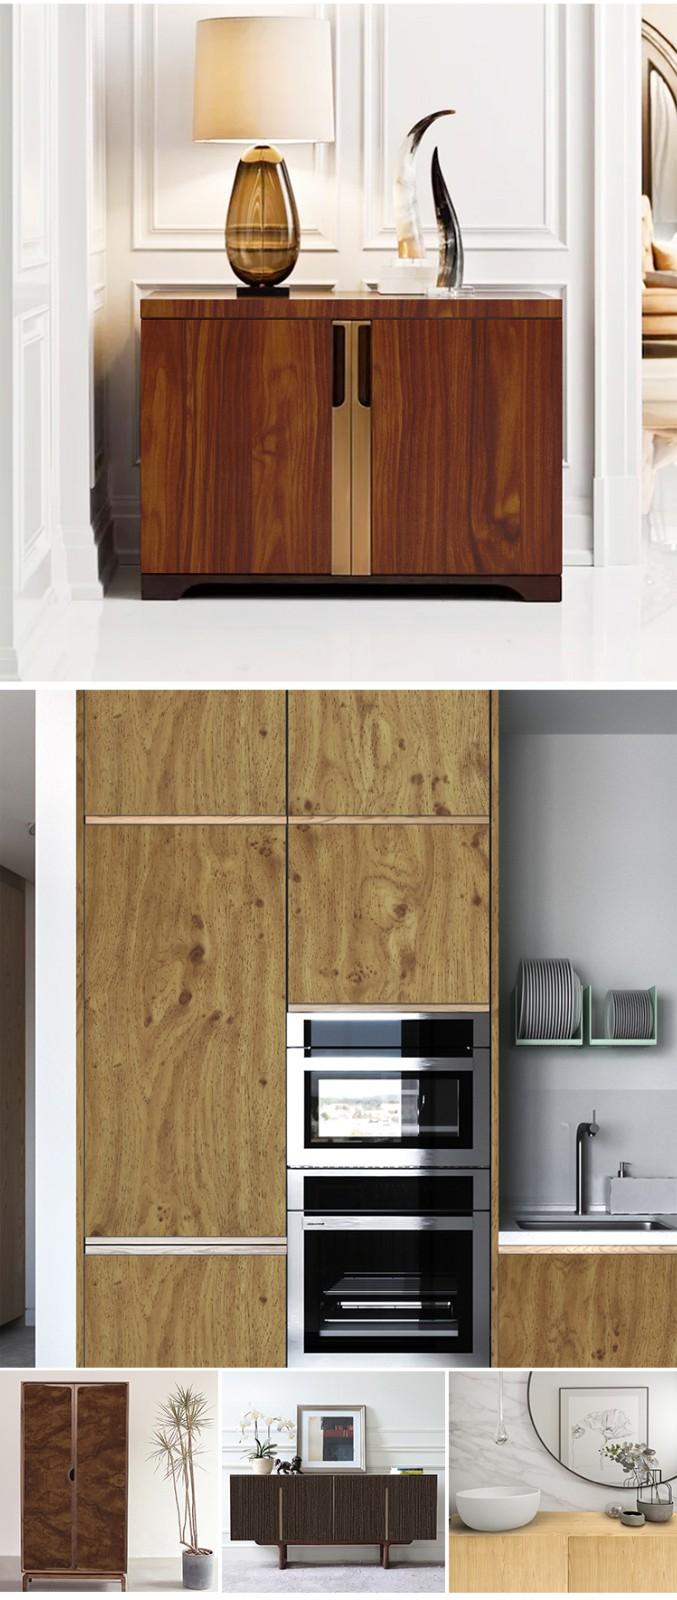 SUNYE wood grain look contact paper directly sale bulk buy-5